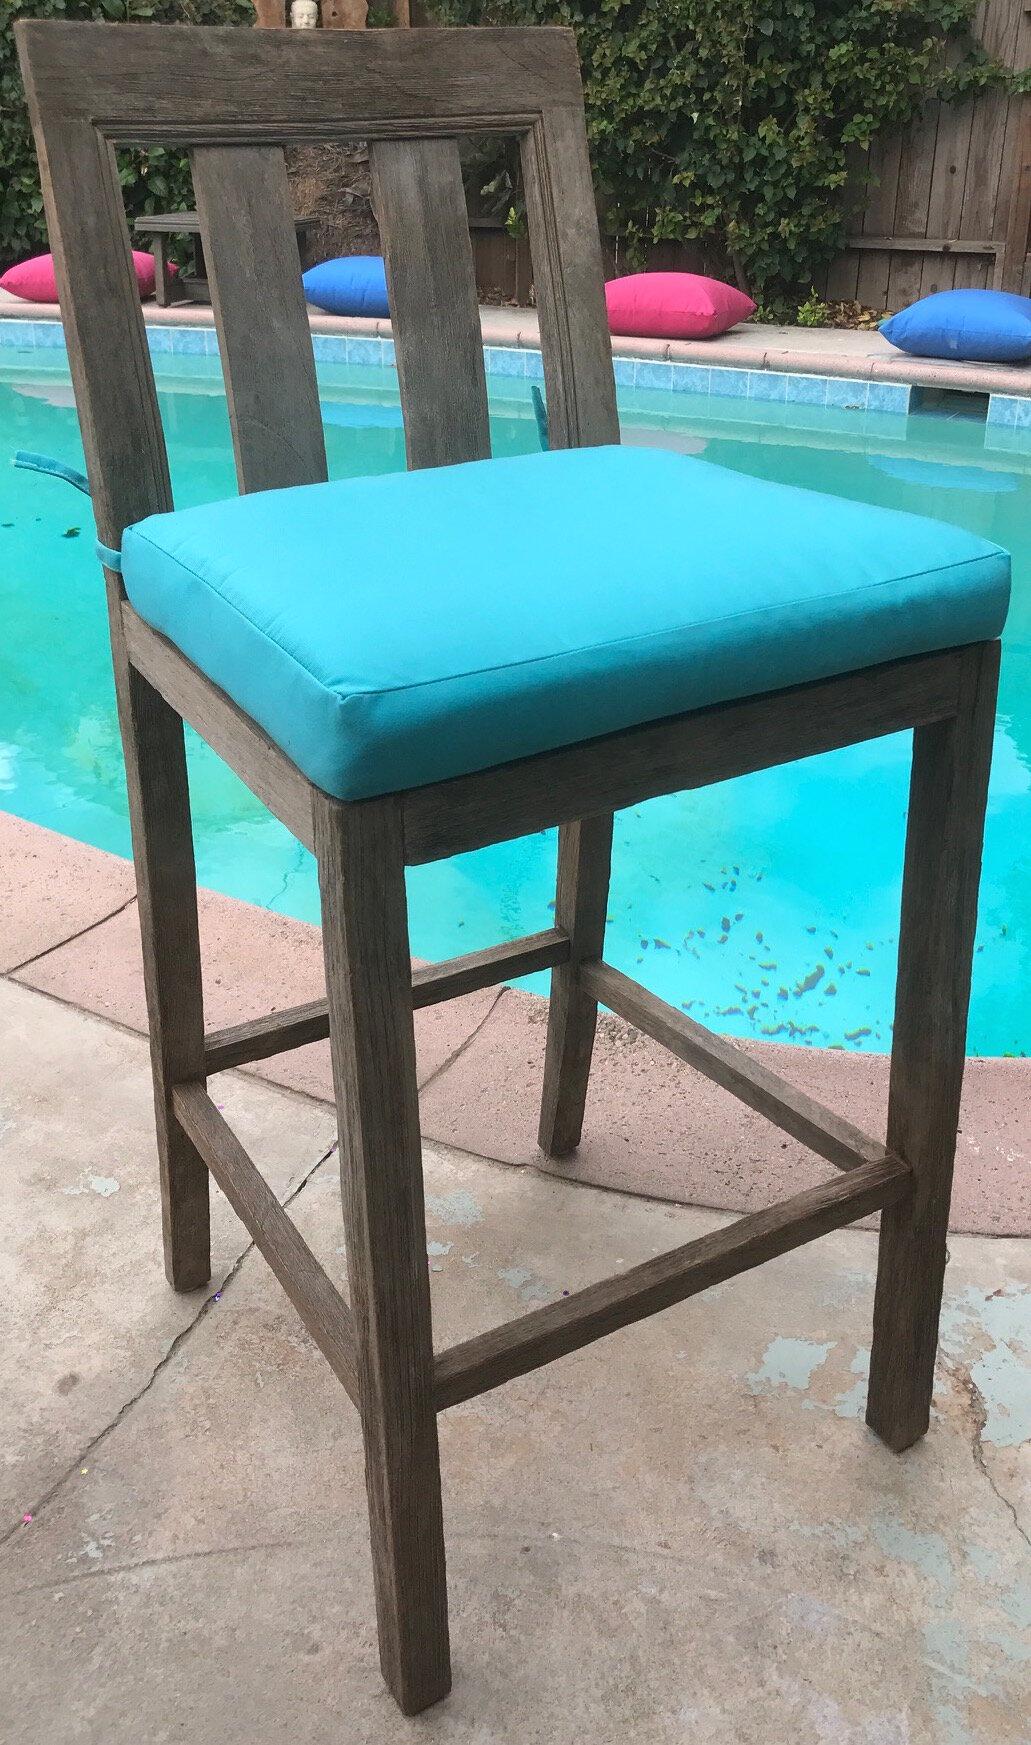 Fine Yandell Teak Outdoor 29 Patio Bar Stool With Cushion Bralicious Painted Fabric Chair Ideas Braliciousco